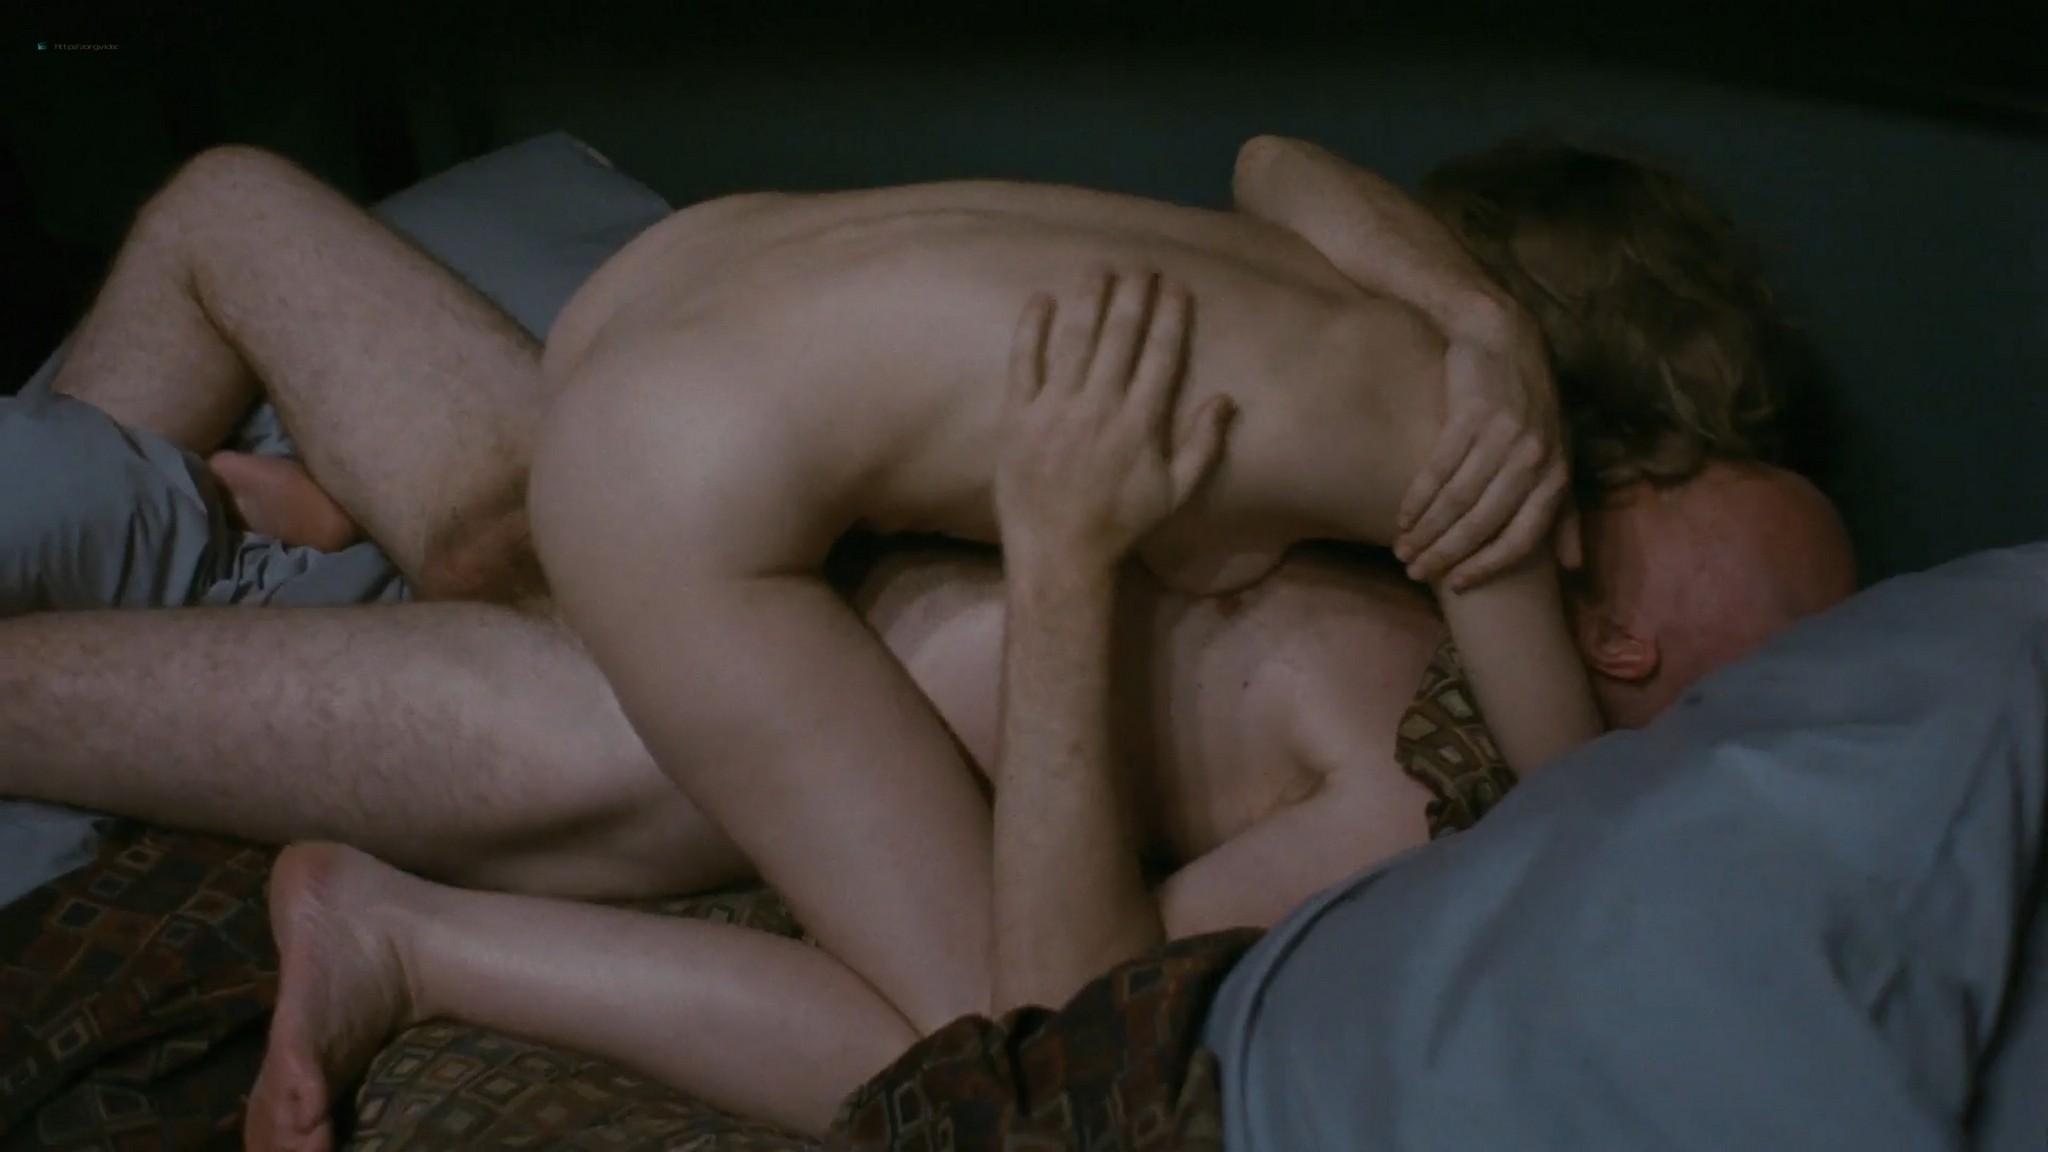 Olga Shkabarnya nude Natalia Berezhnaya nude explicit sex - DAU Natasha (2020) HD 1080p Web (19)